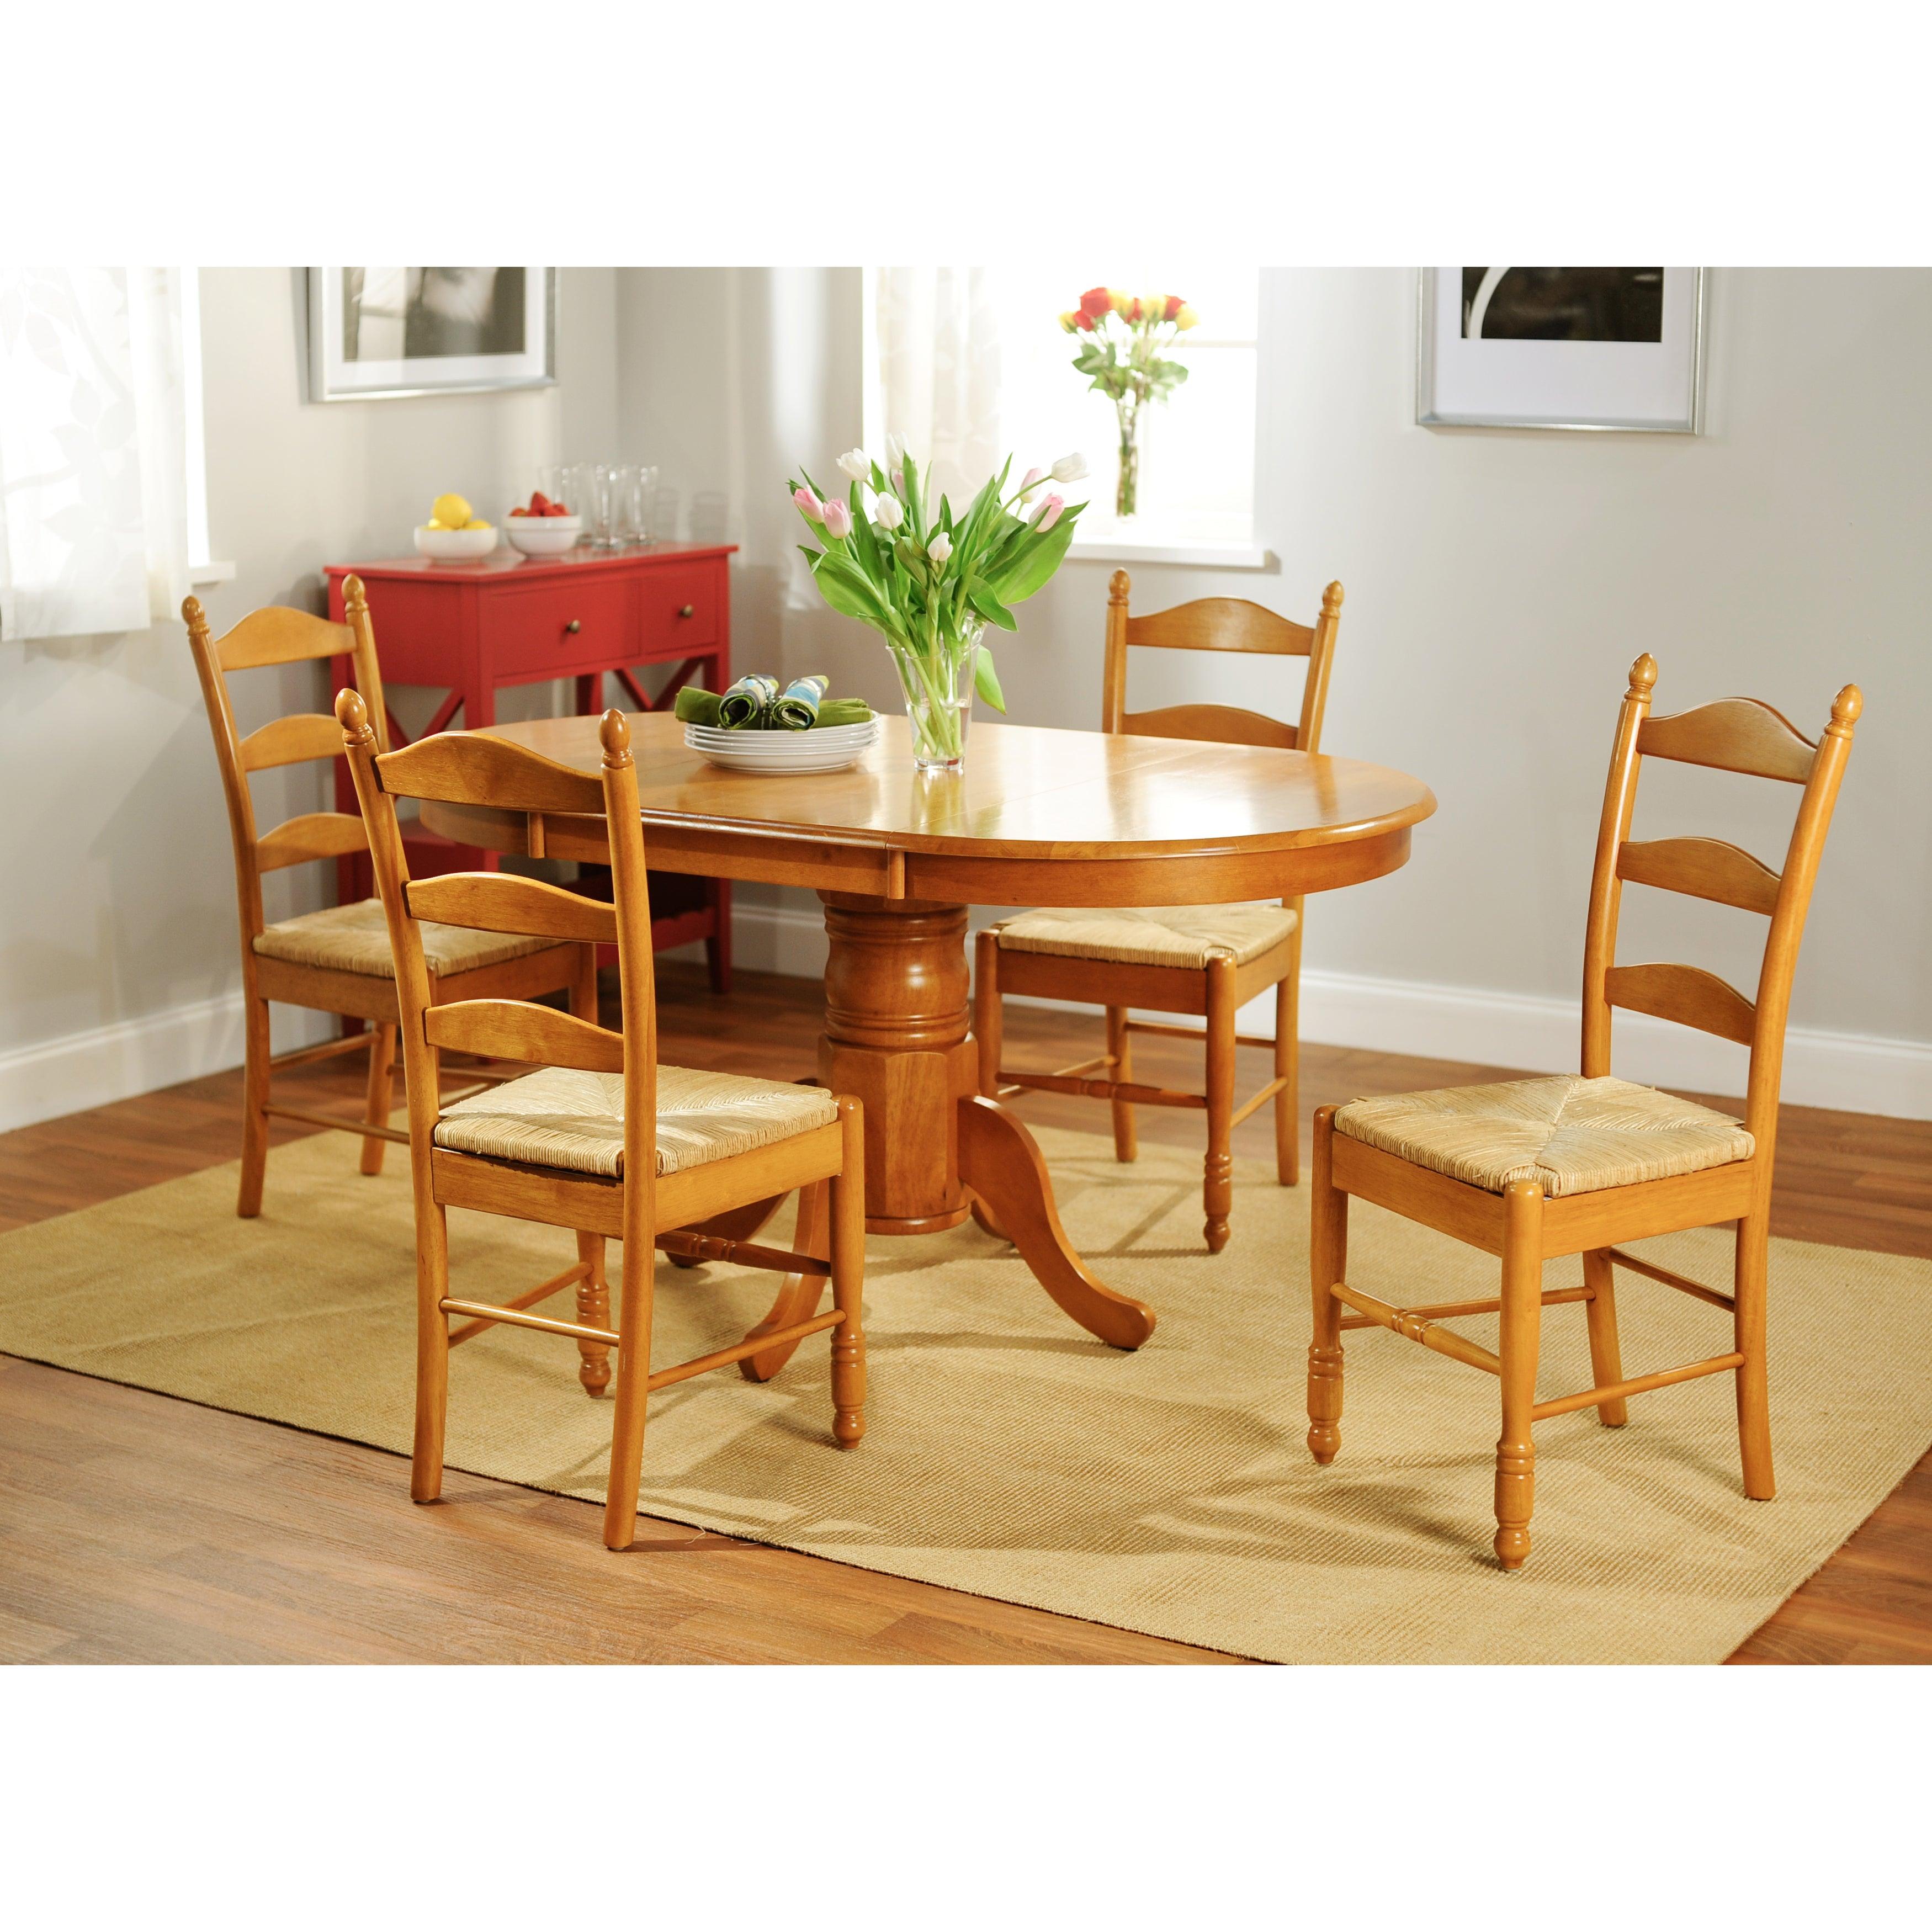 Simple Living Oak Finish 5-piece Ladderback Dining Set